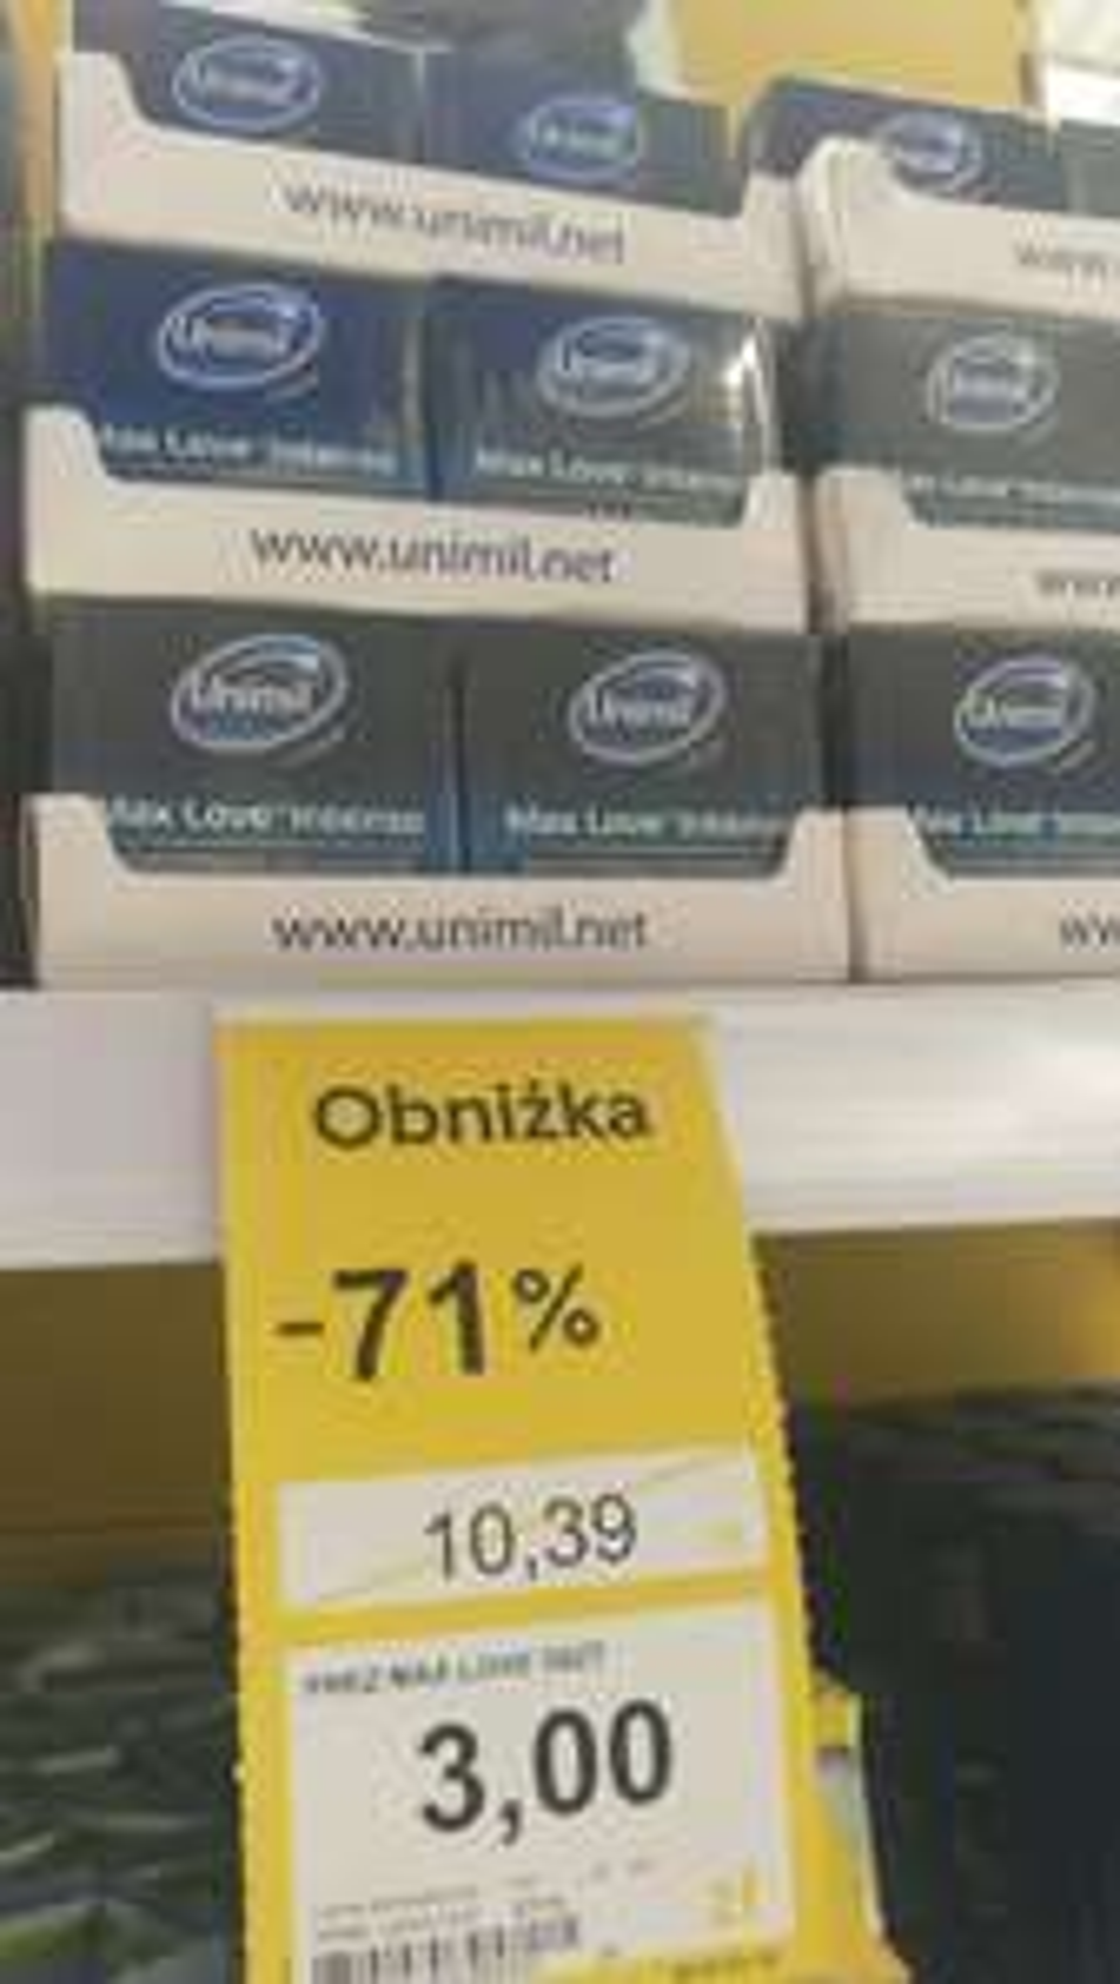 Prezerwatywy Unimil - Max Love Intense / Tesco Kabaty